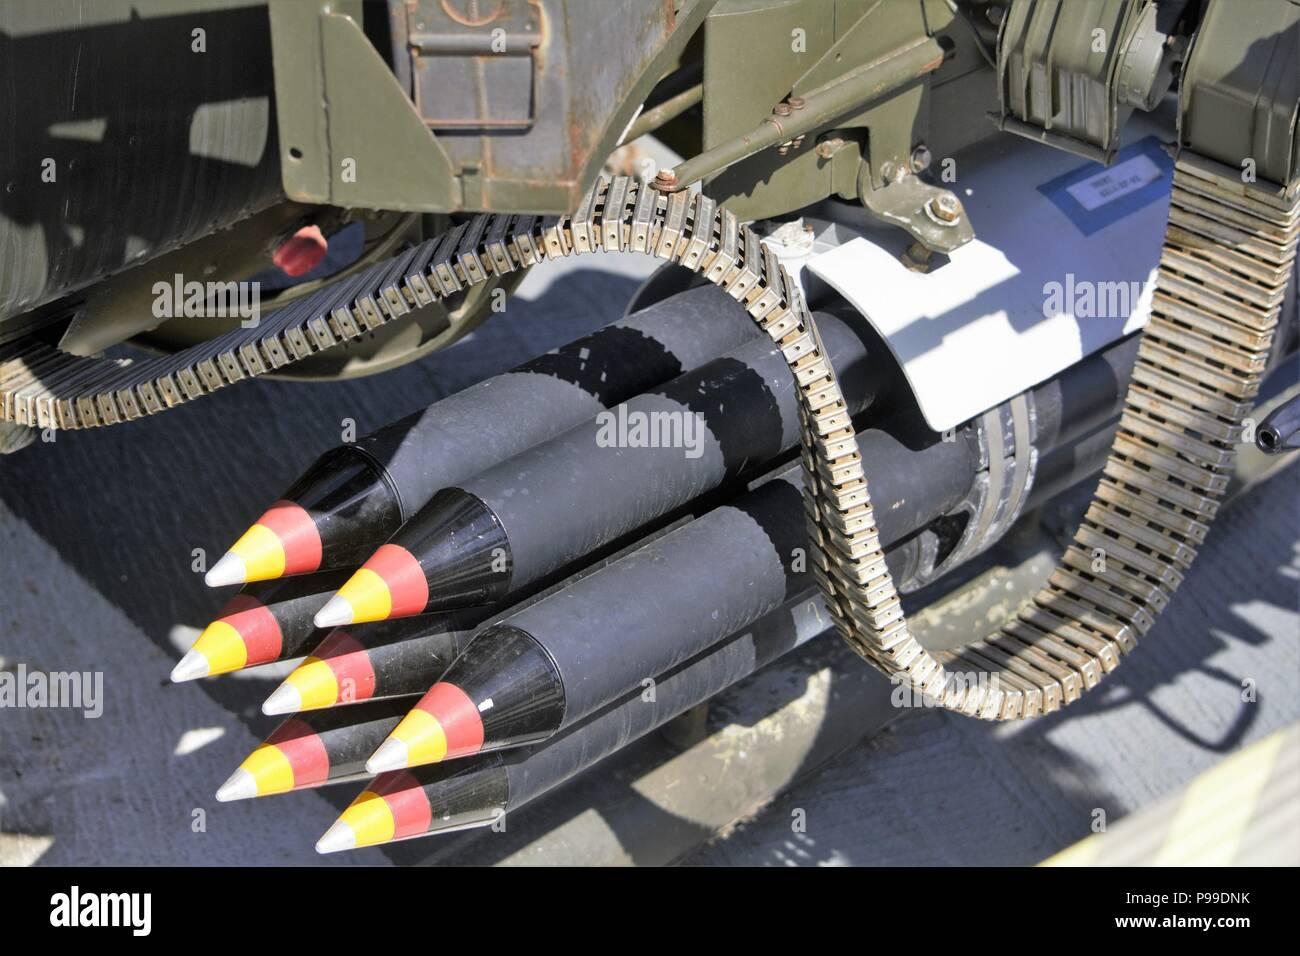 70mm rockets - Stock Image